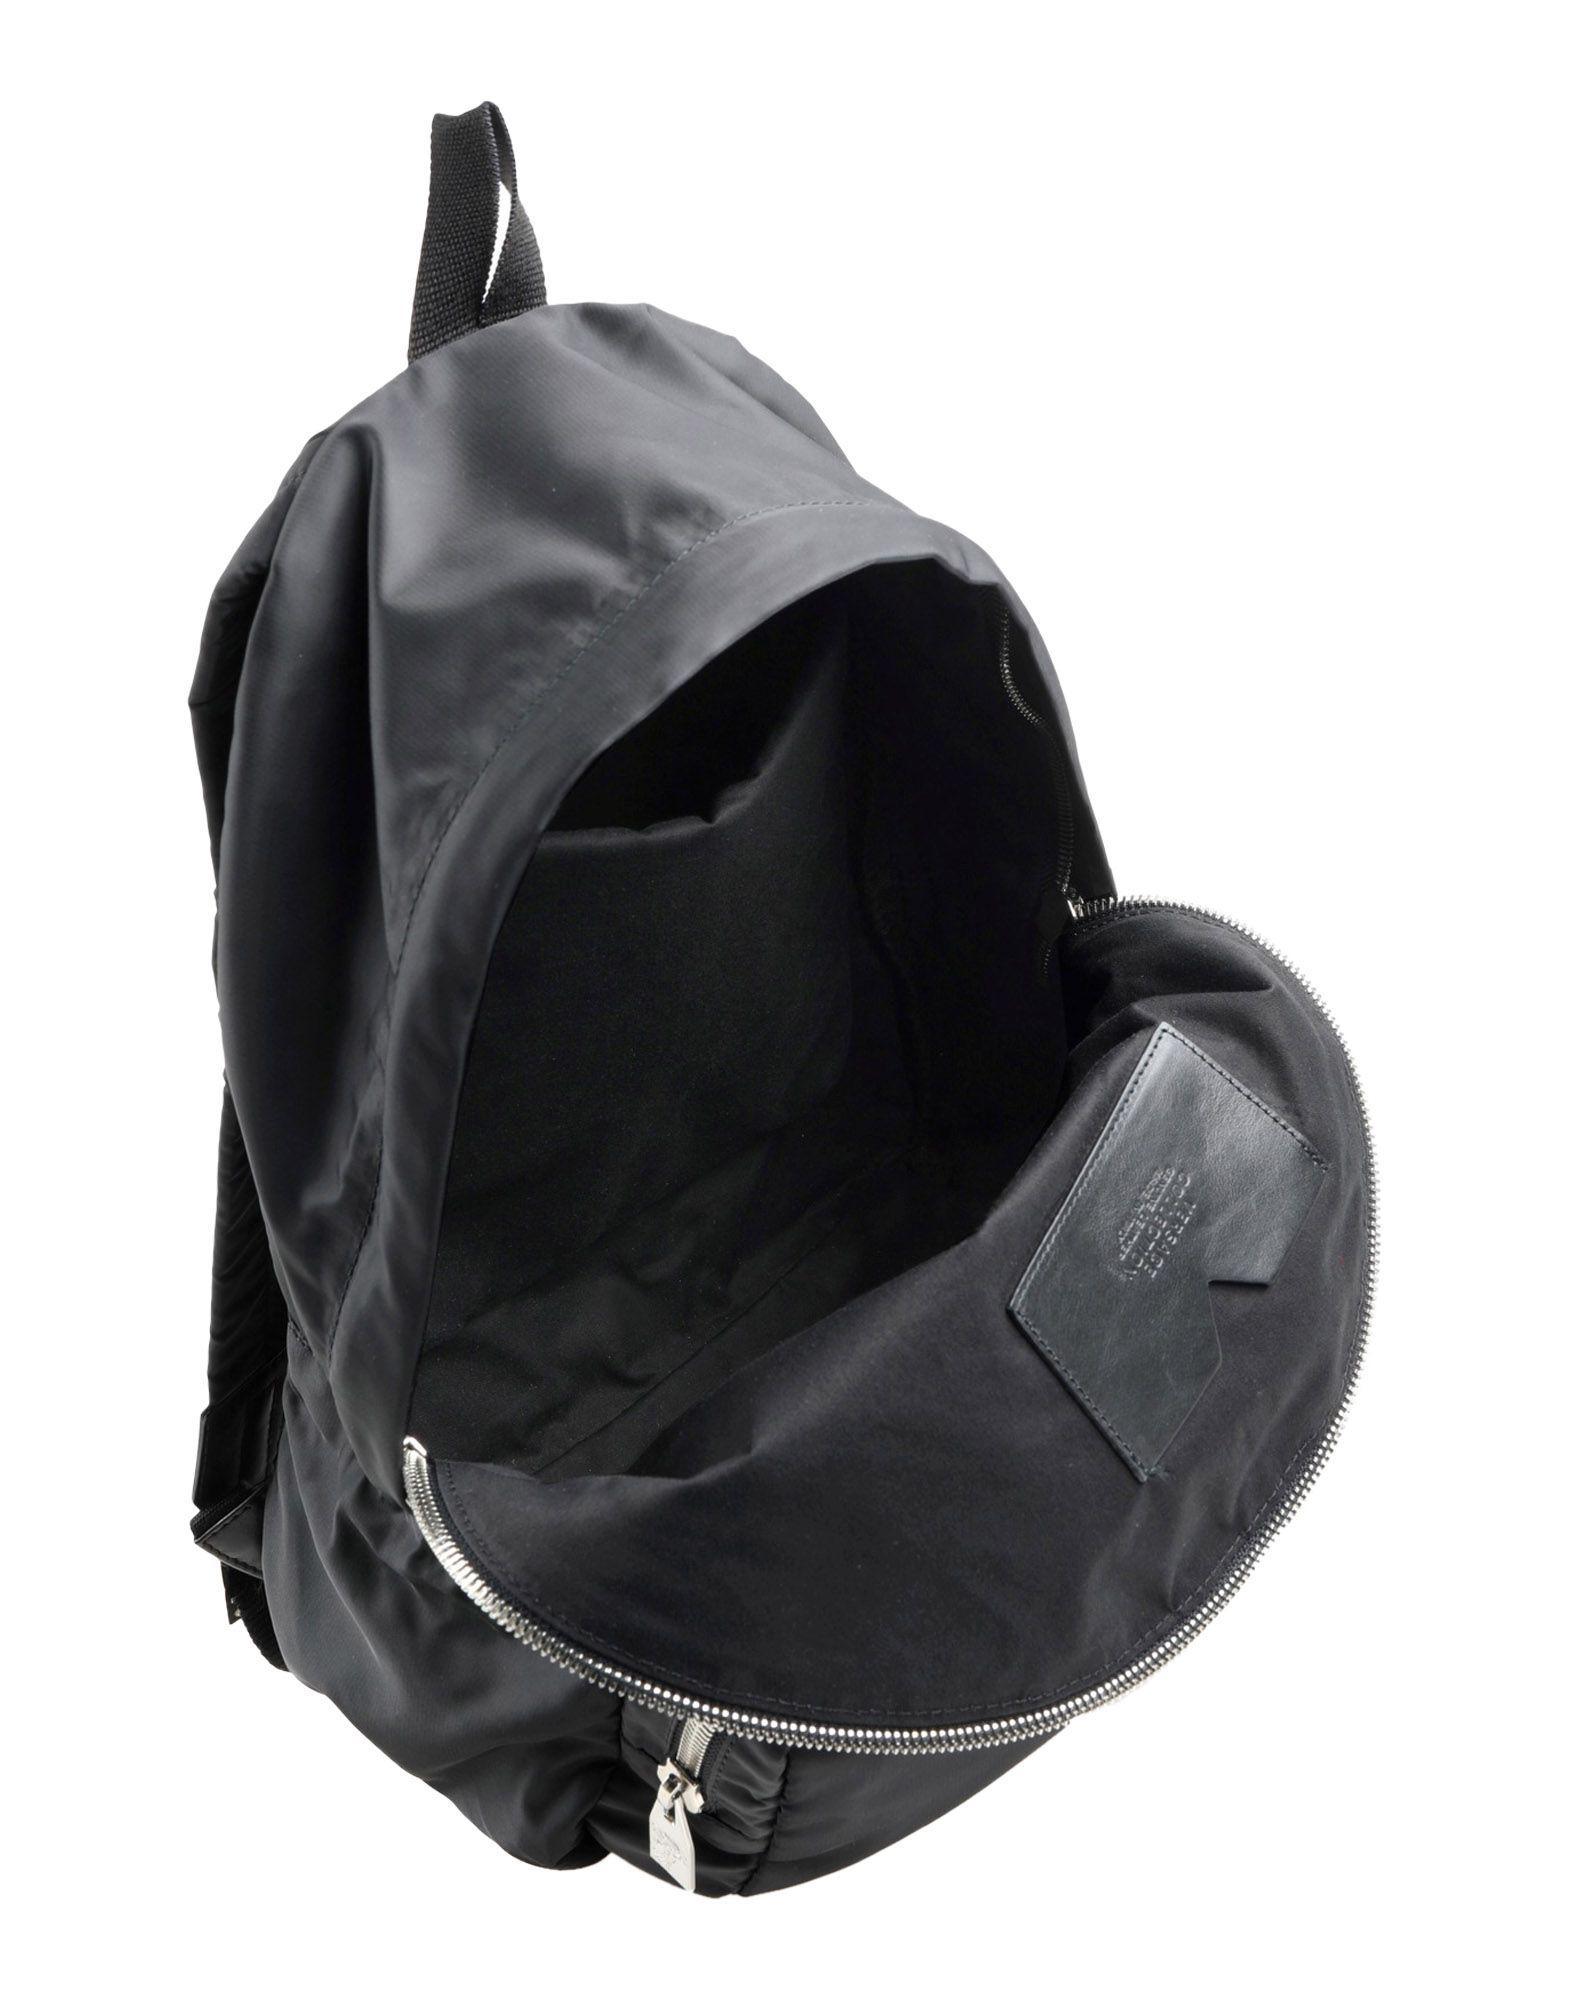 66d73cec71 Versace Backpacks   Bum Bags in Black for Men - Lyst